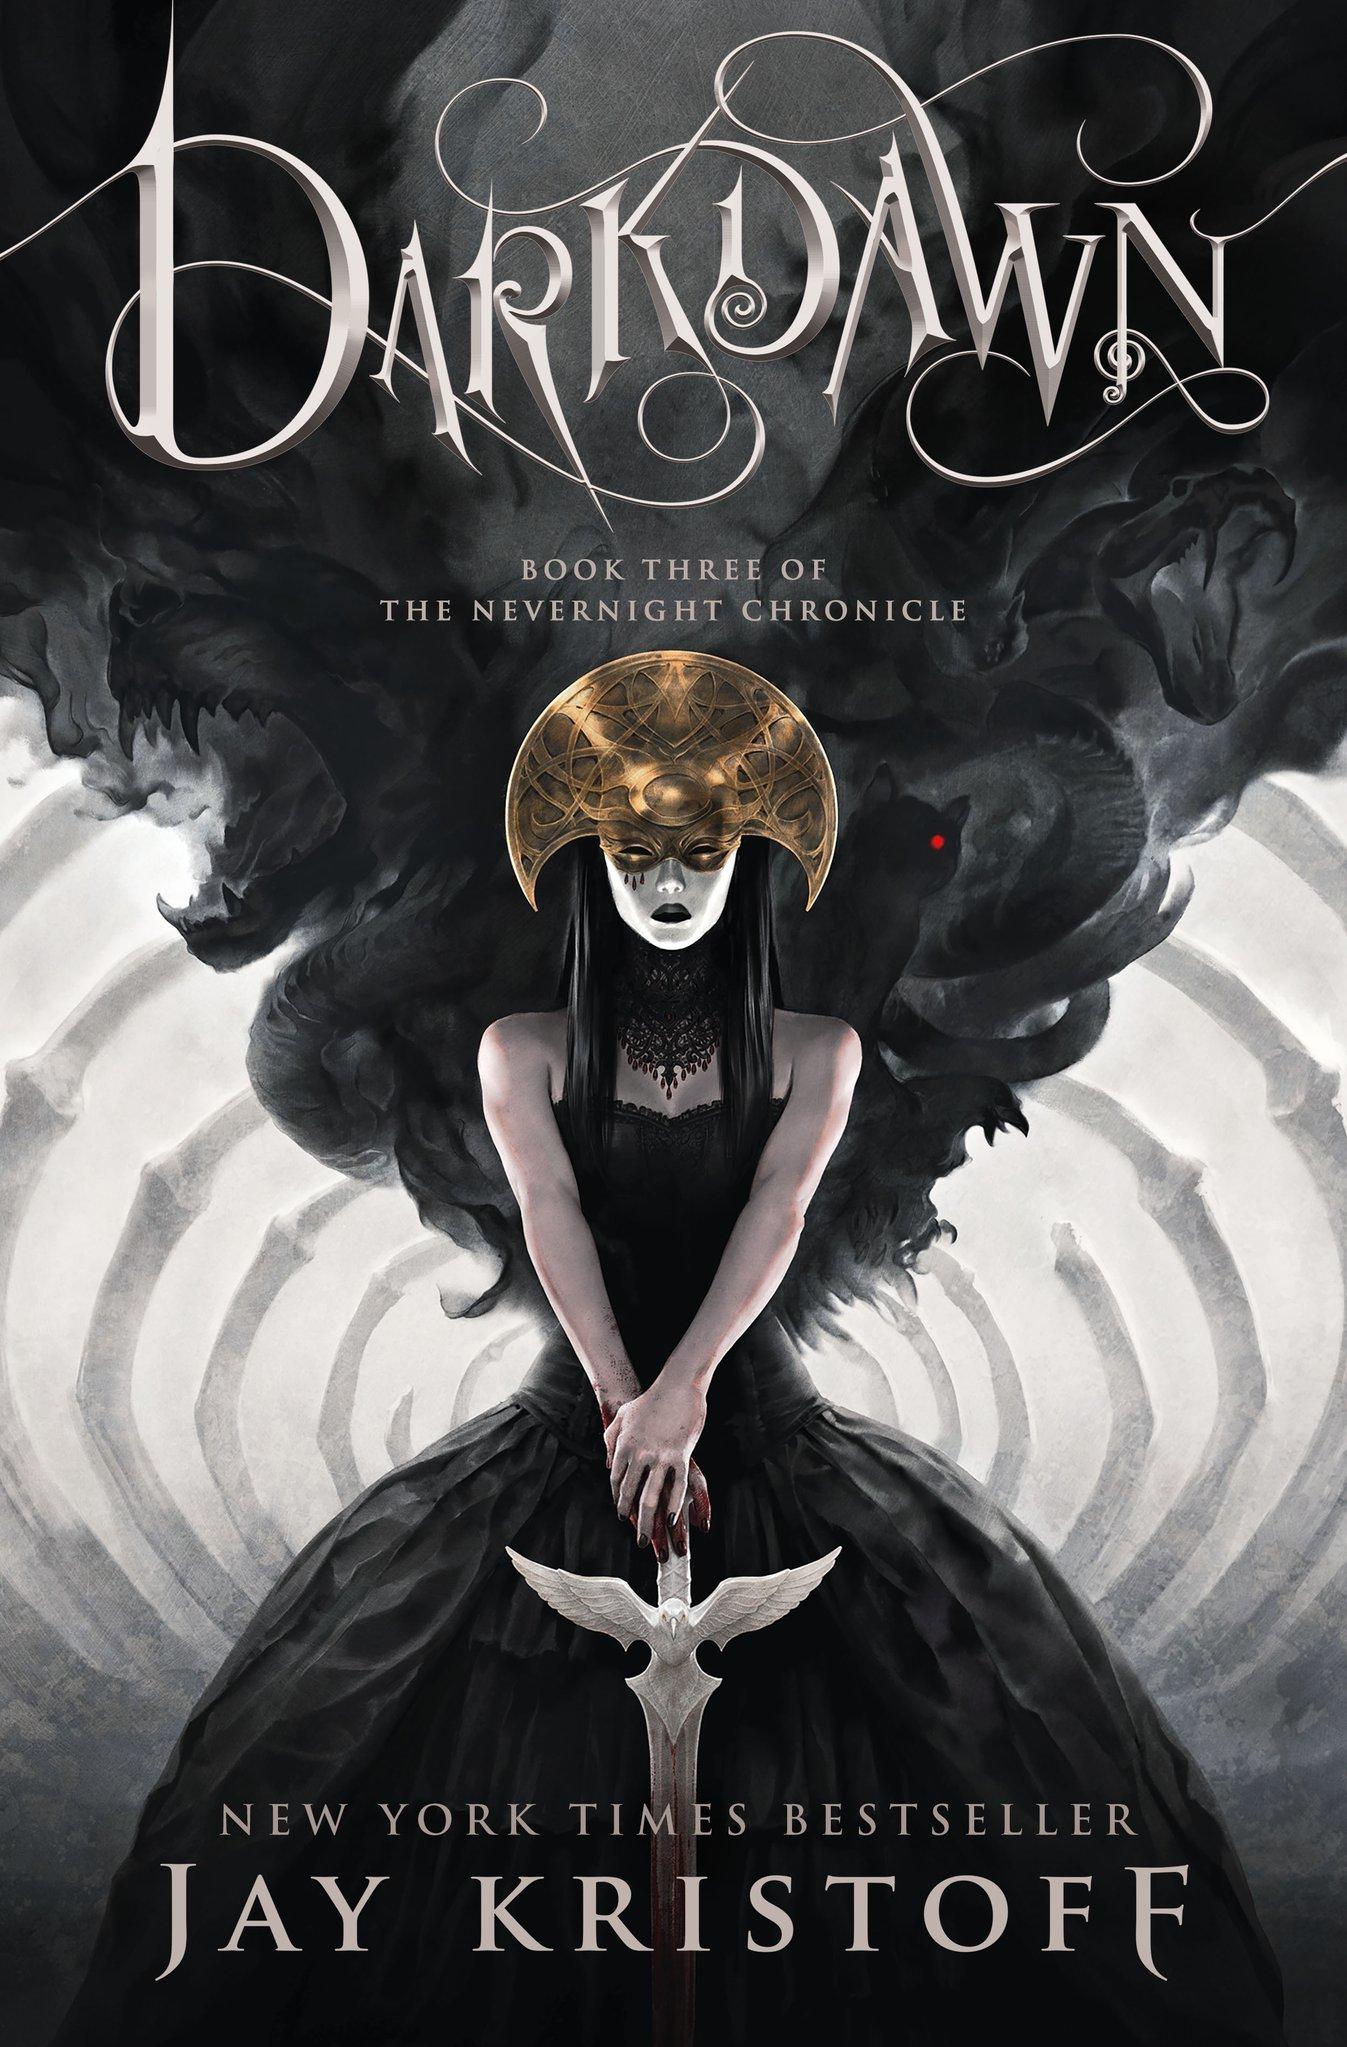 Jay Kristoff - (Nevernight Chronicle 3) Darkdawn